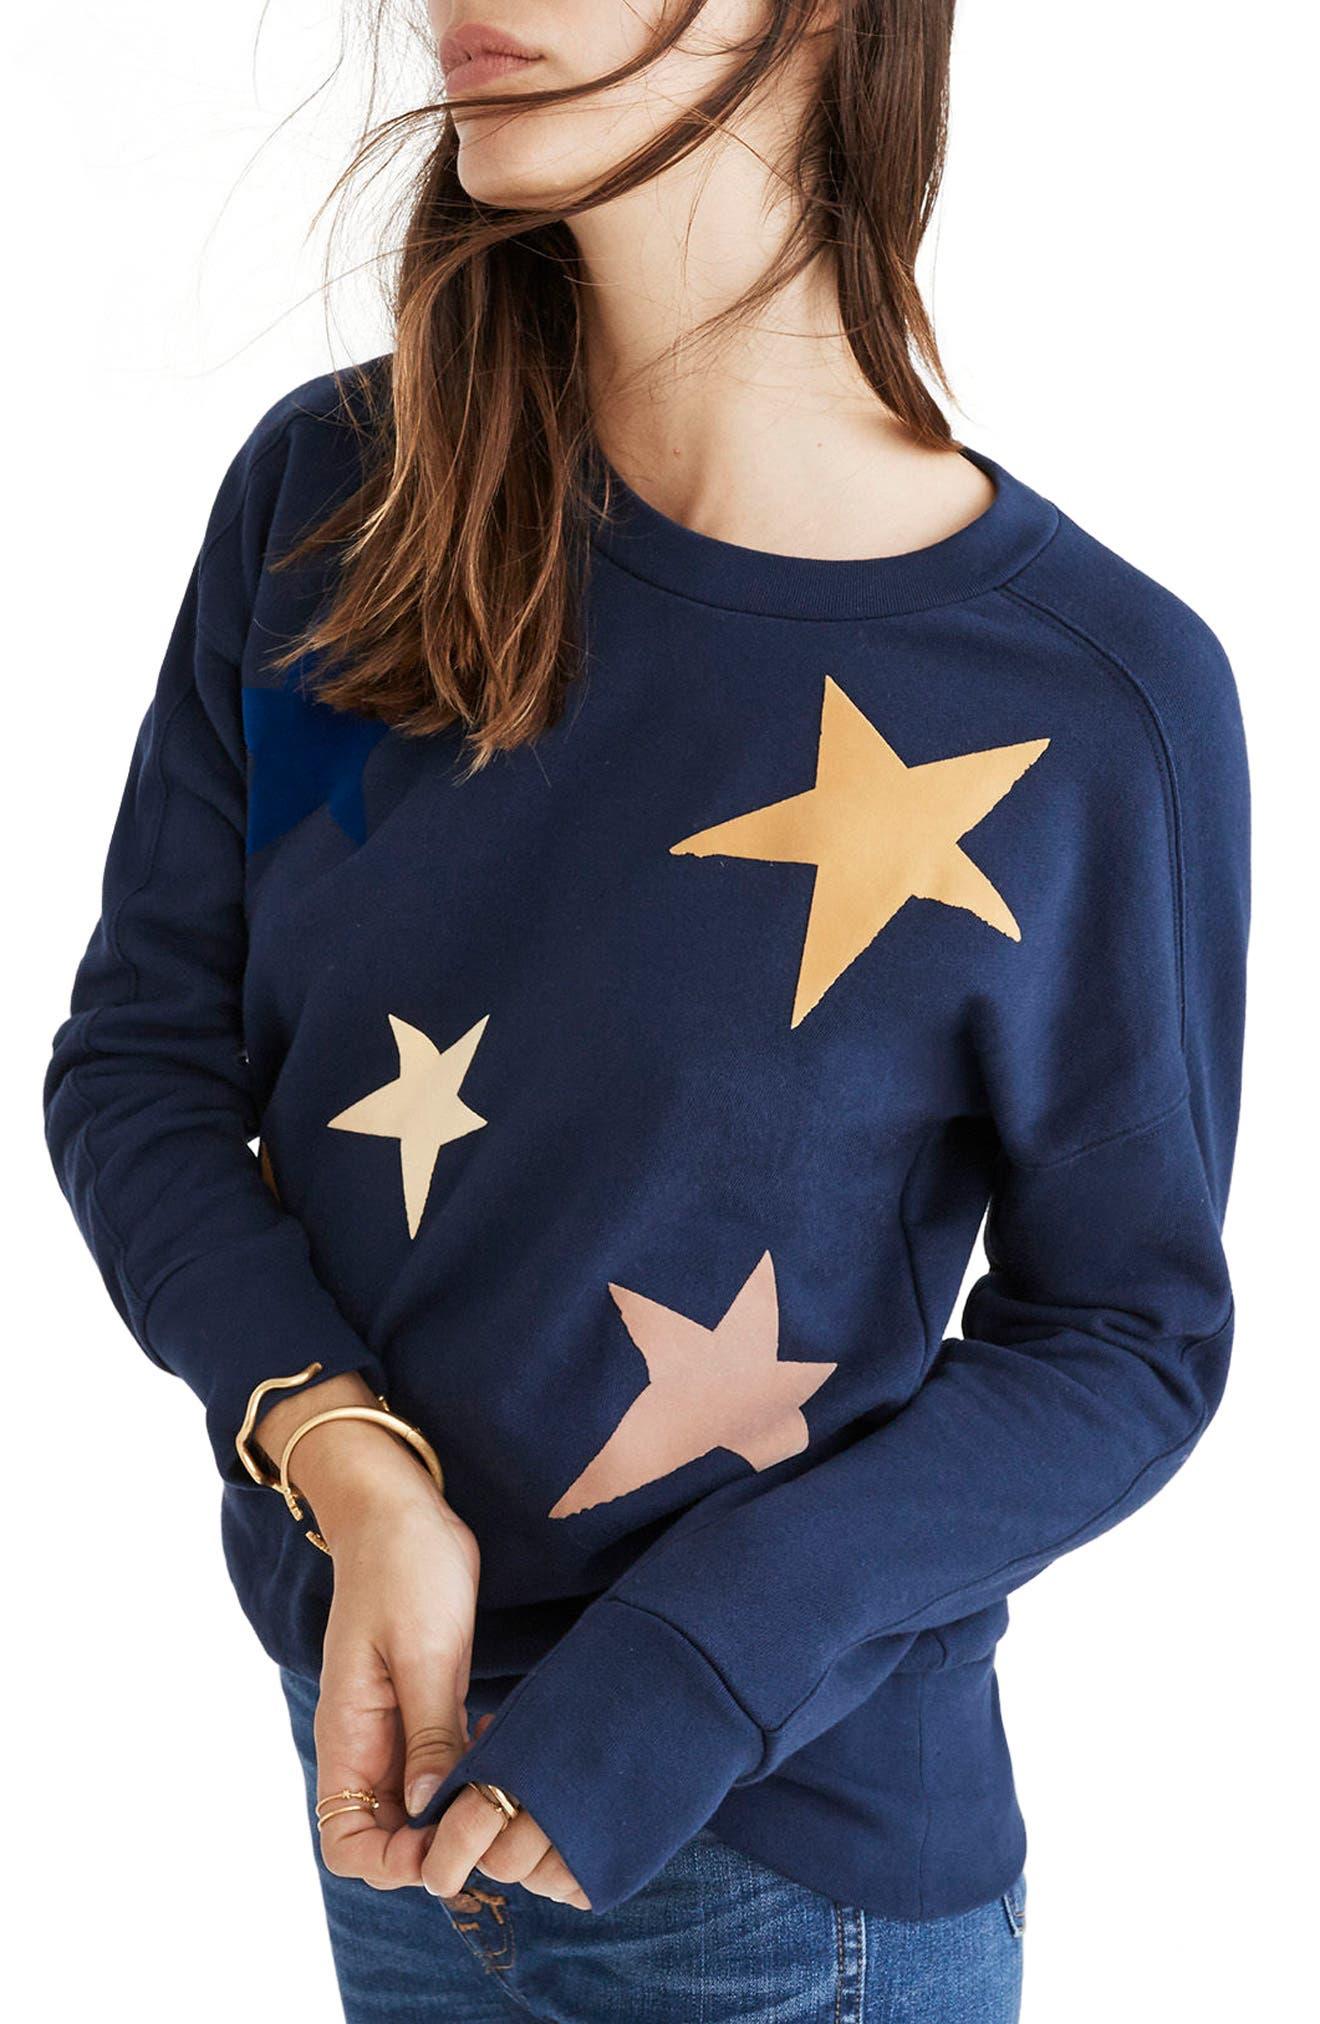 Main Image - Madewell Starry Sweatshirt